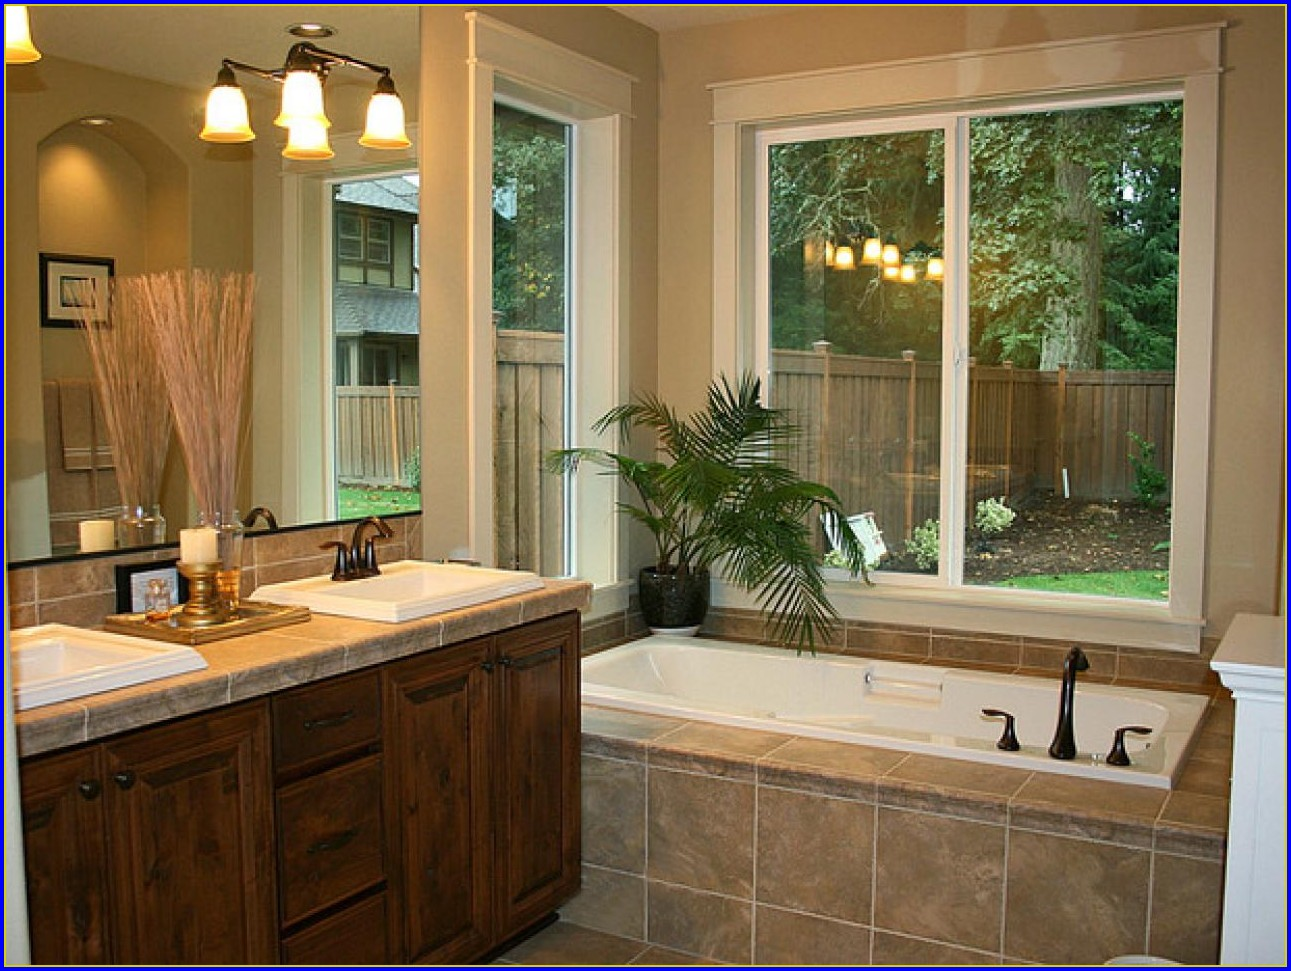 Hgtv Bathroom Remodeling Designs